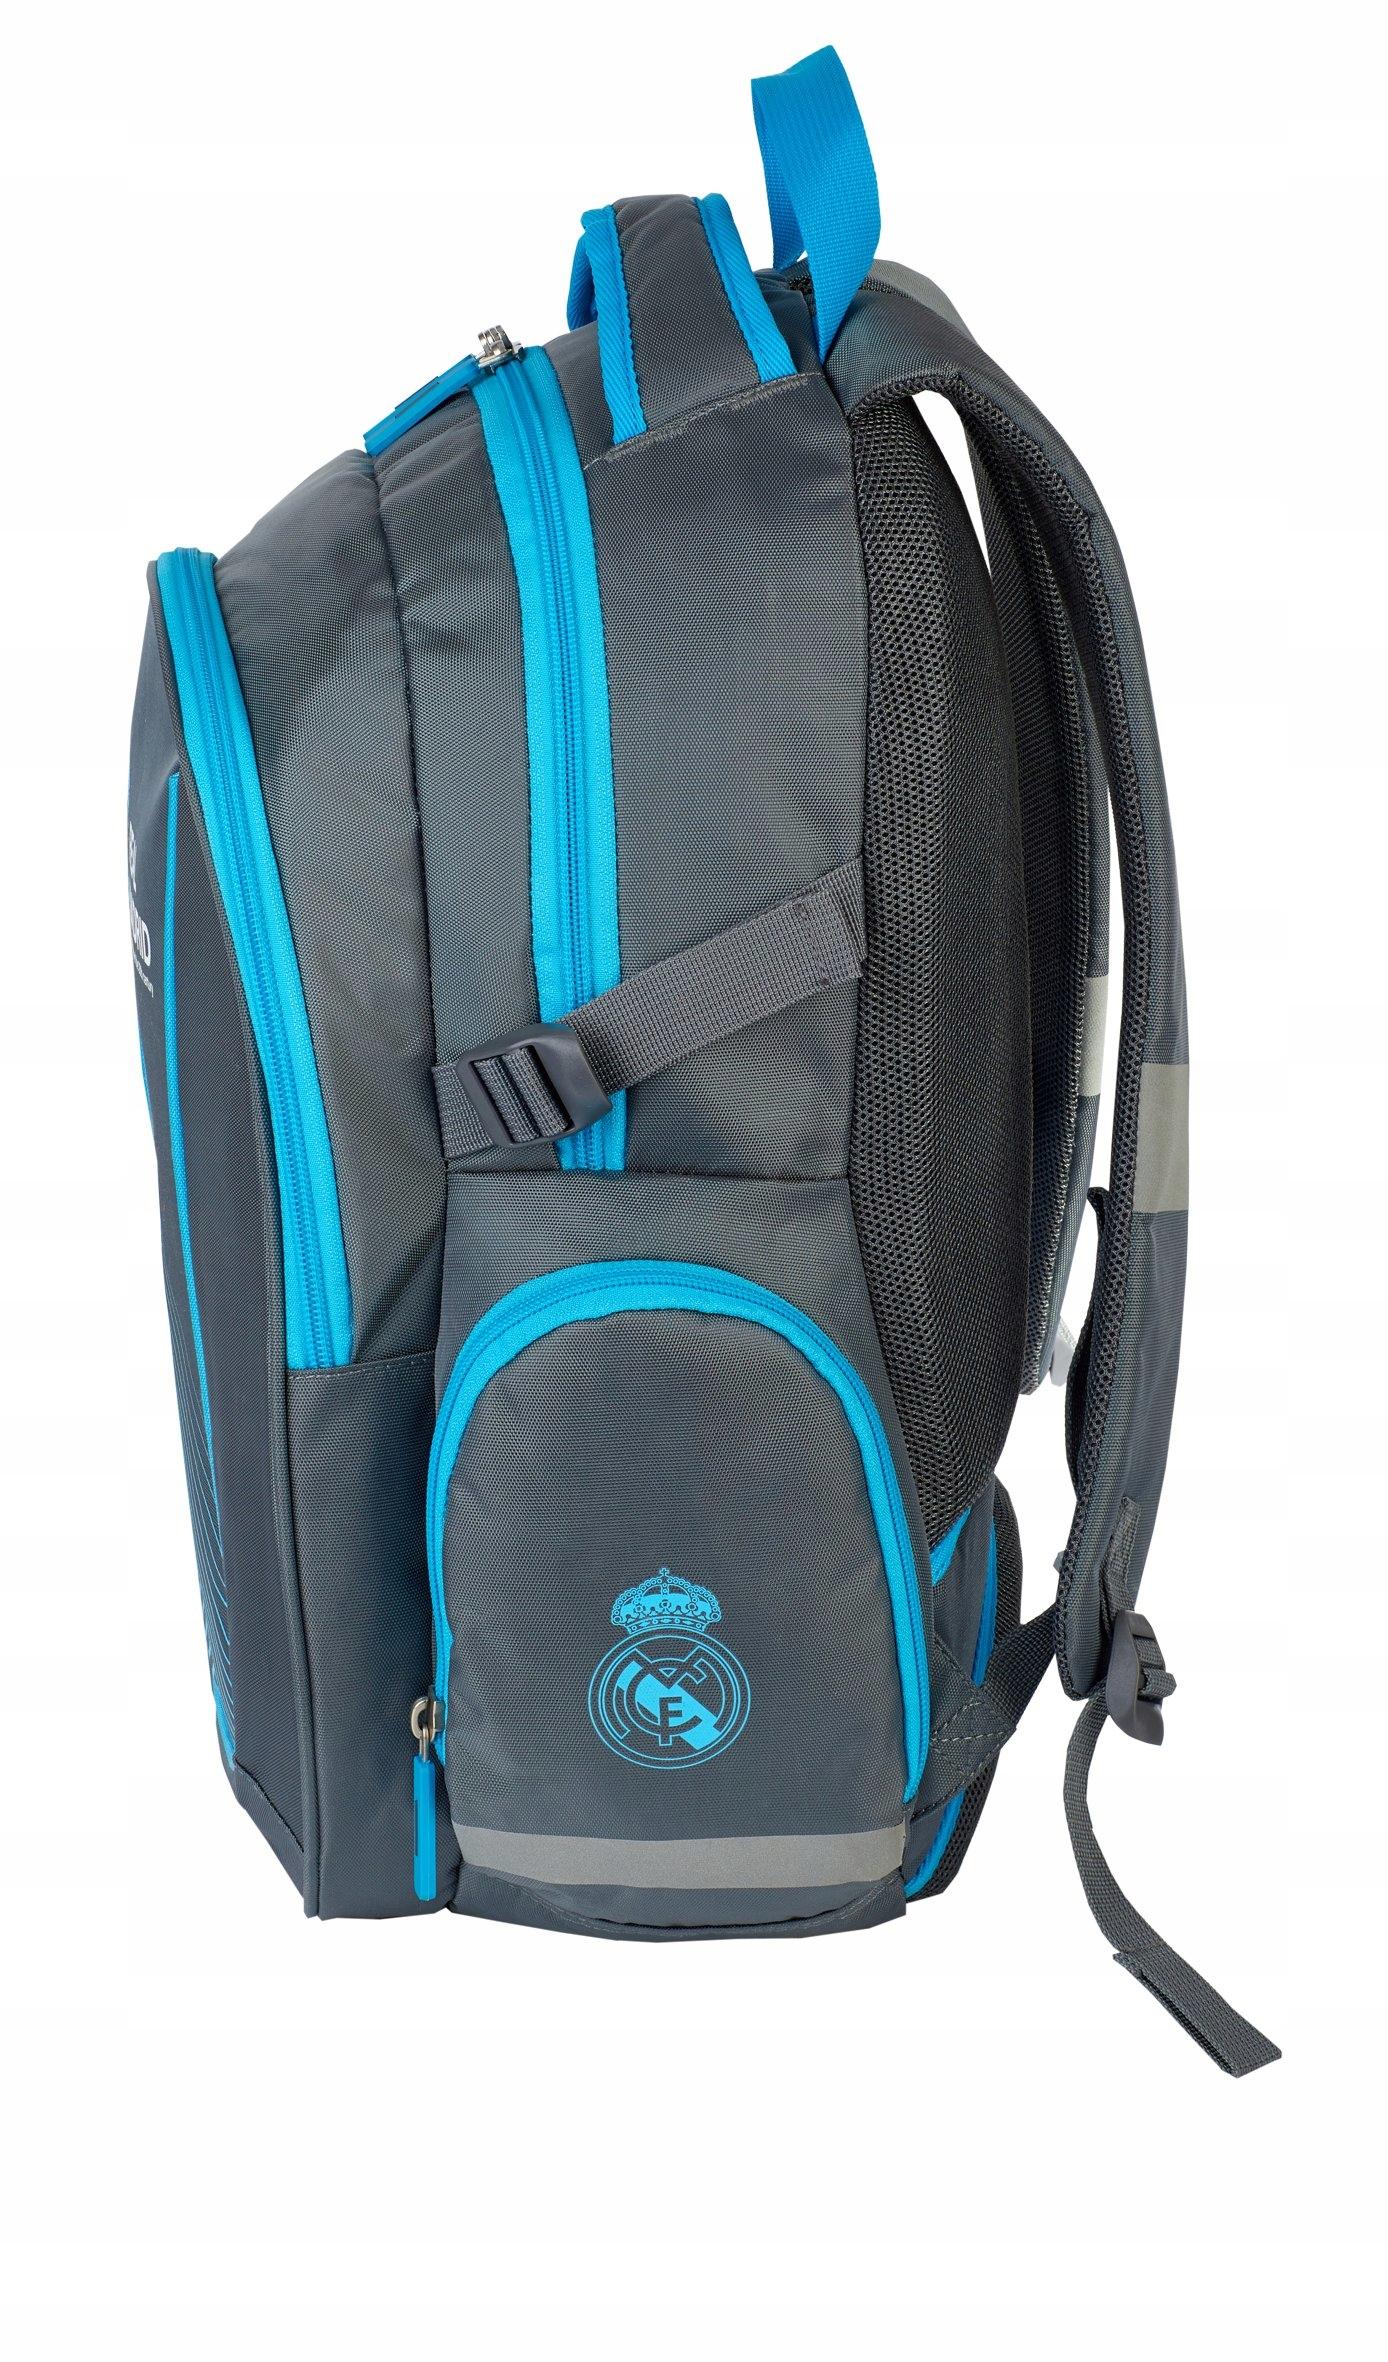 1d10710ef1e4f Plecak szkolny Astra Real Madryt RM-148 502018014 - 7311718552 ...